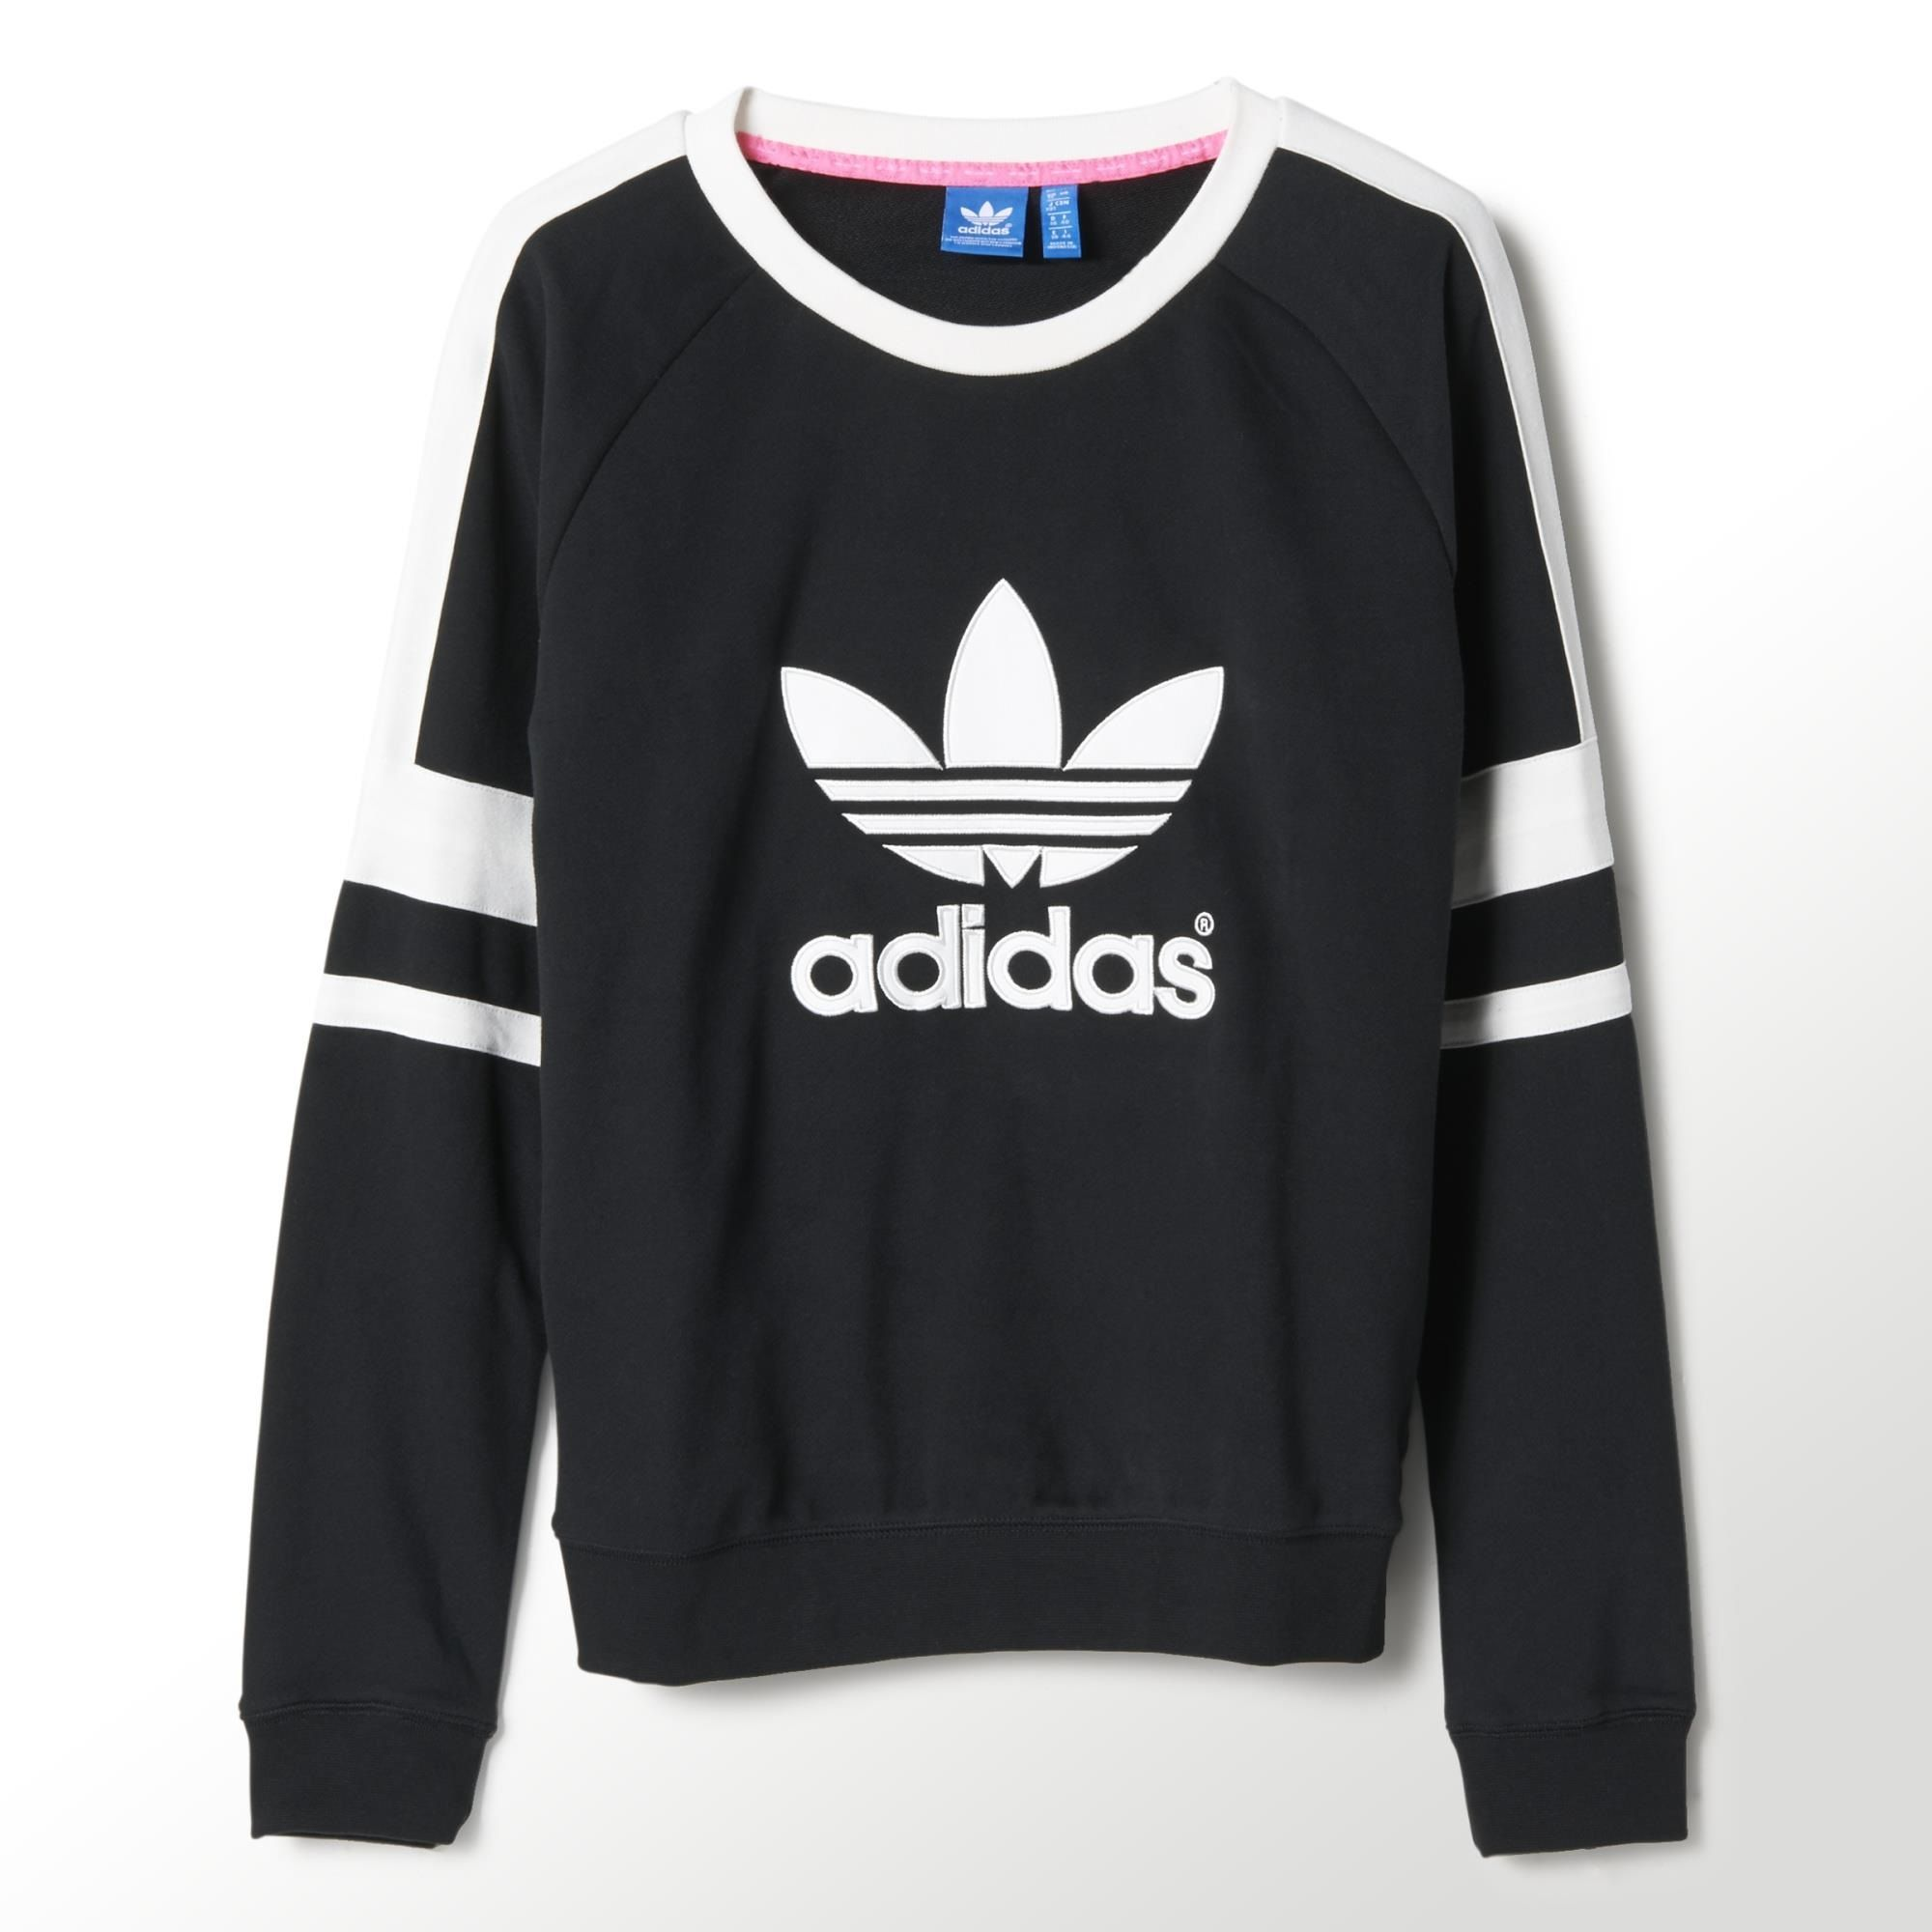 adidas sweater adidas sweatshirt ❤ ❤️ RFTWRDE